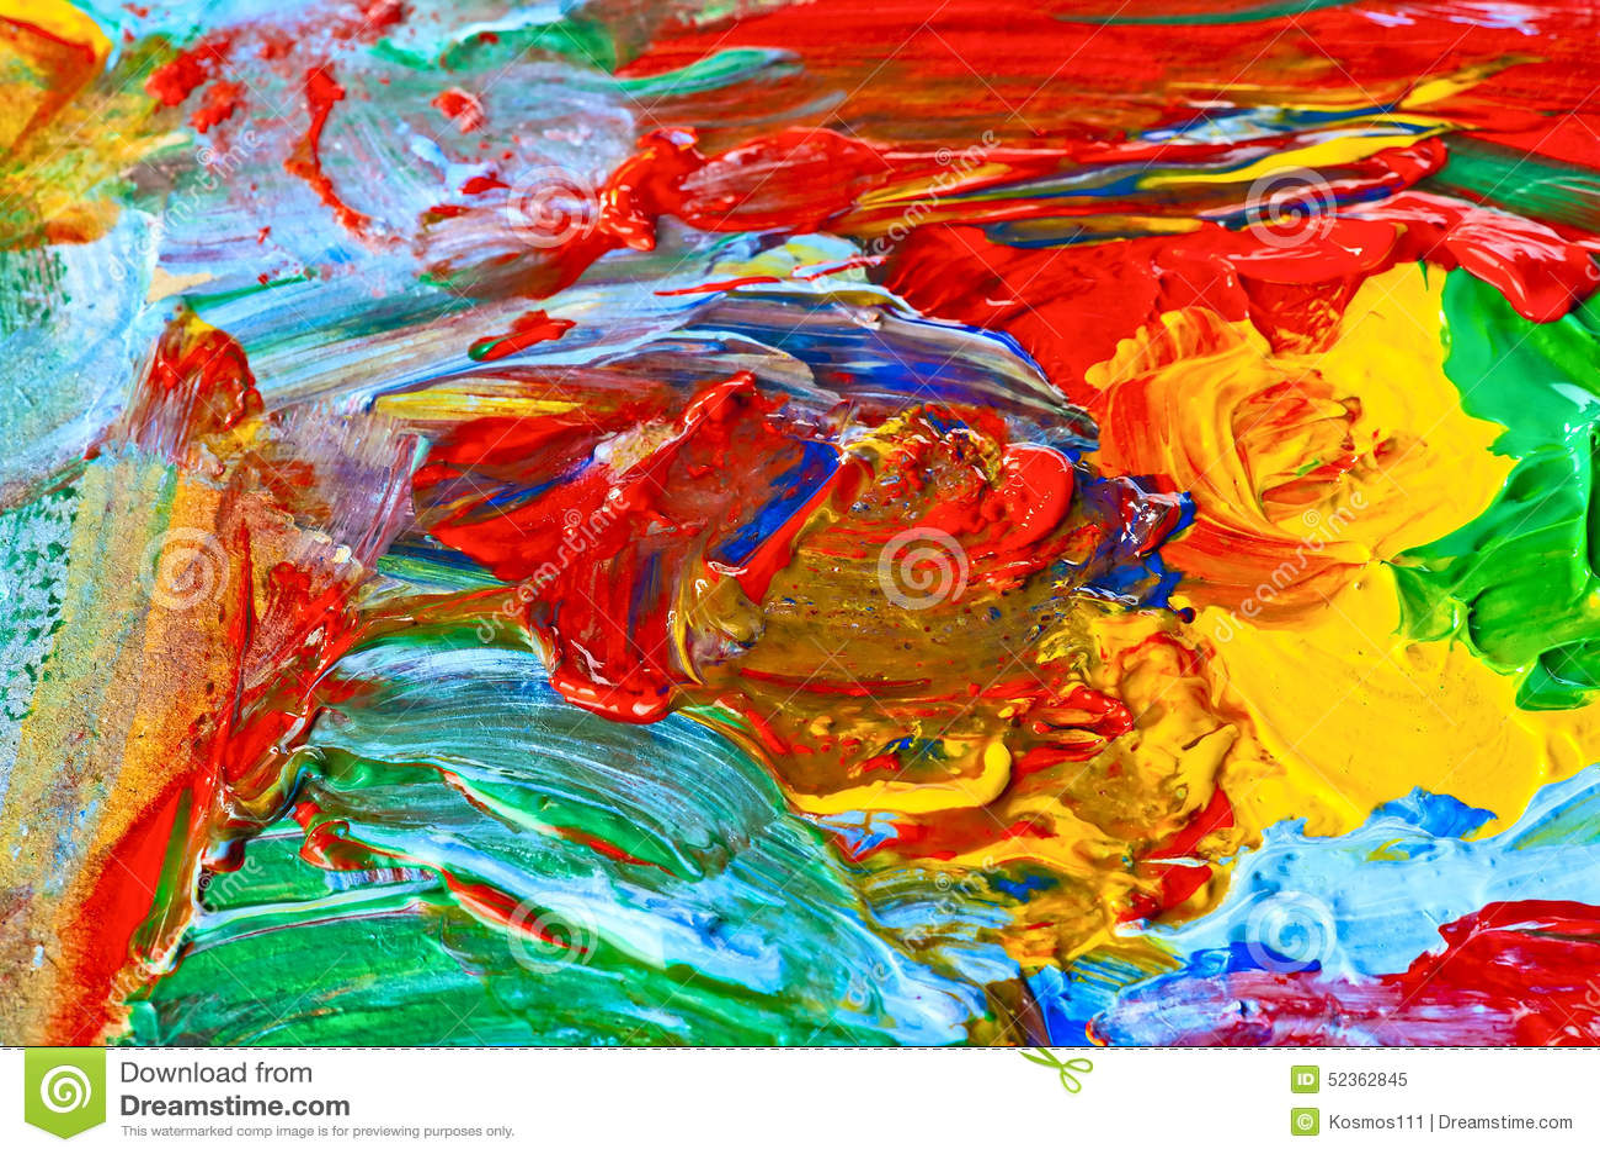 Art moderne peinture abstraite image stock image 52362845 for Art moderne peinture